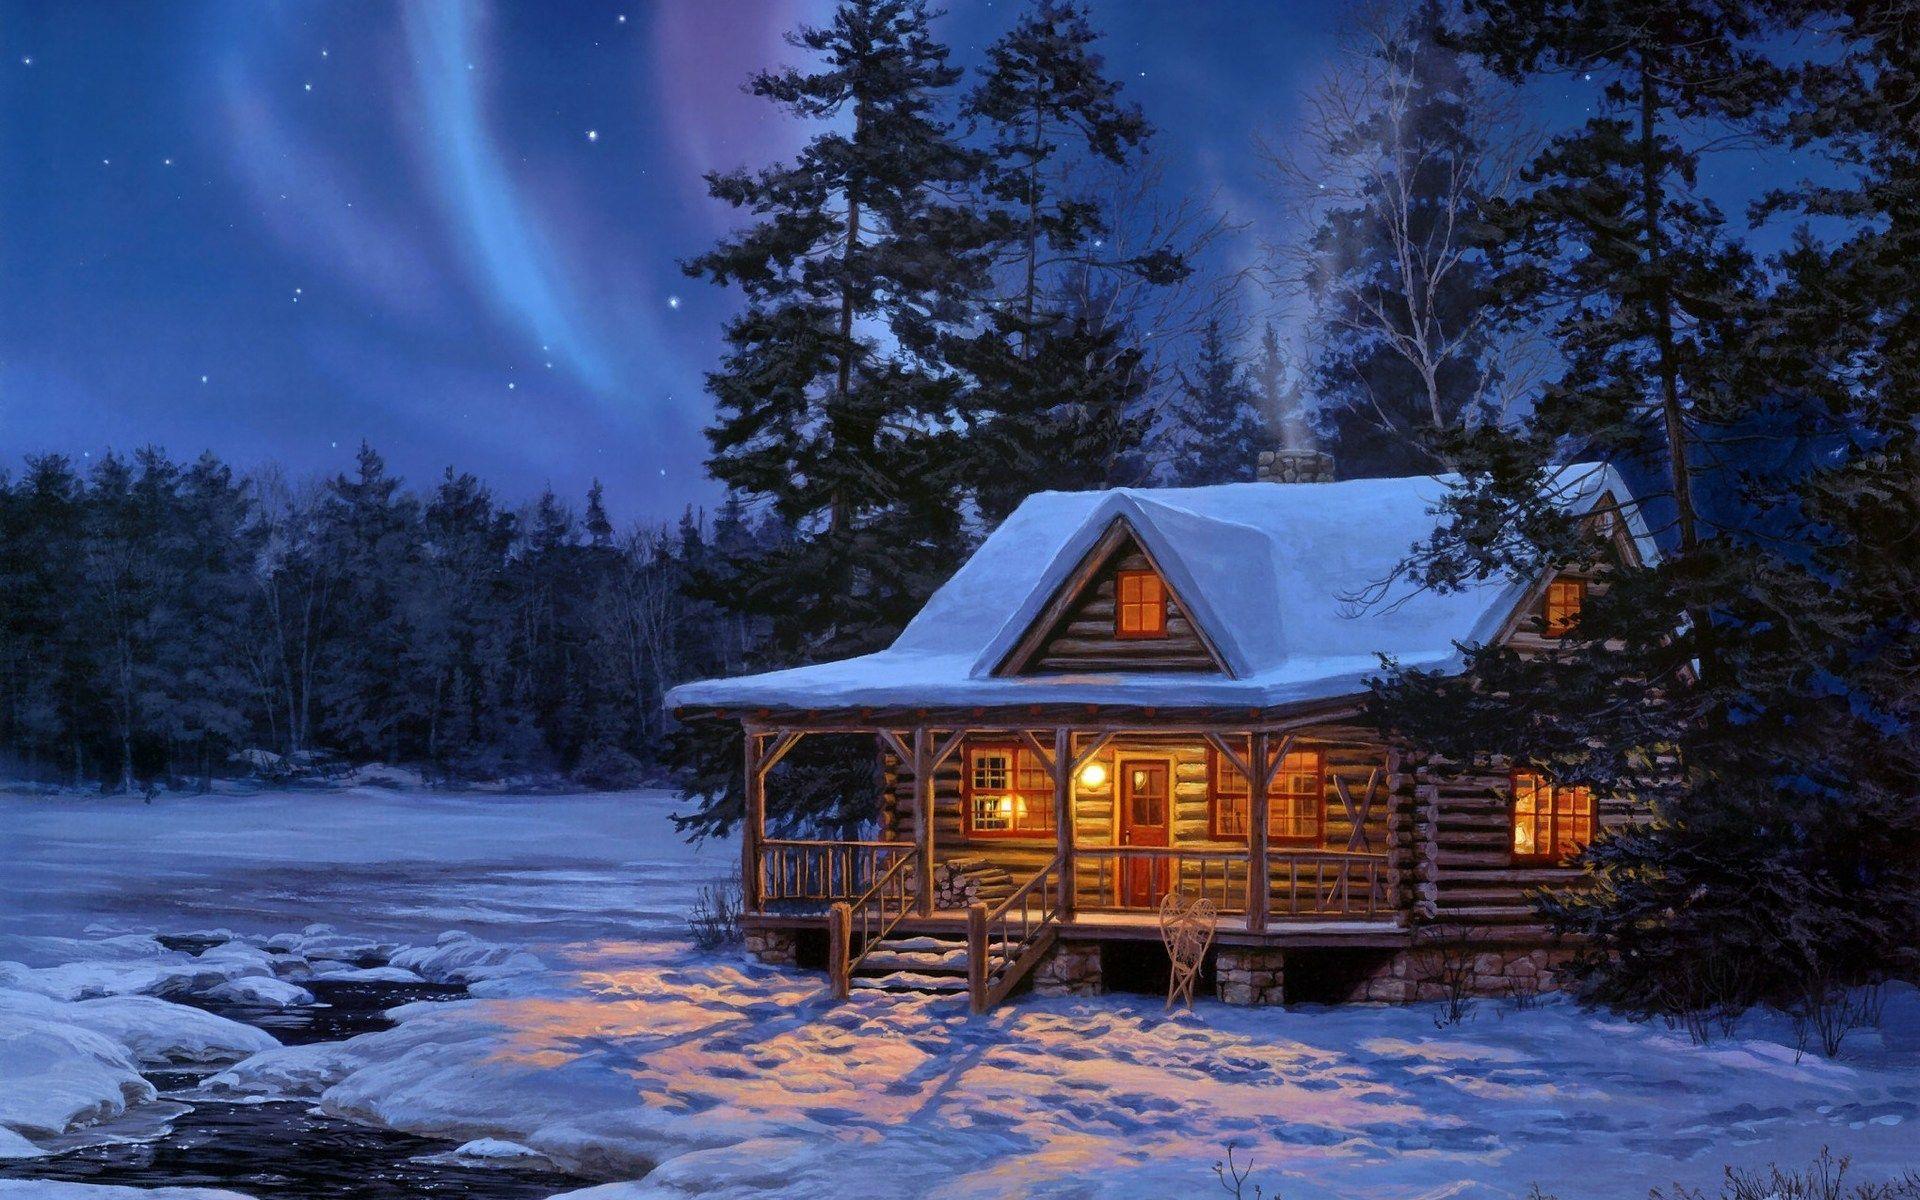 фото новогодней избушки вот ллойд брайт